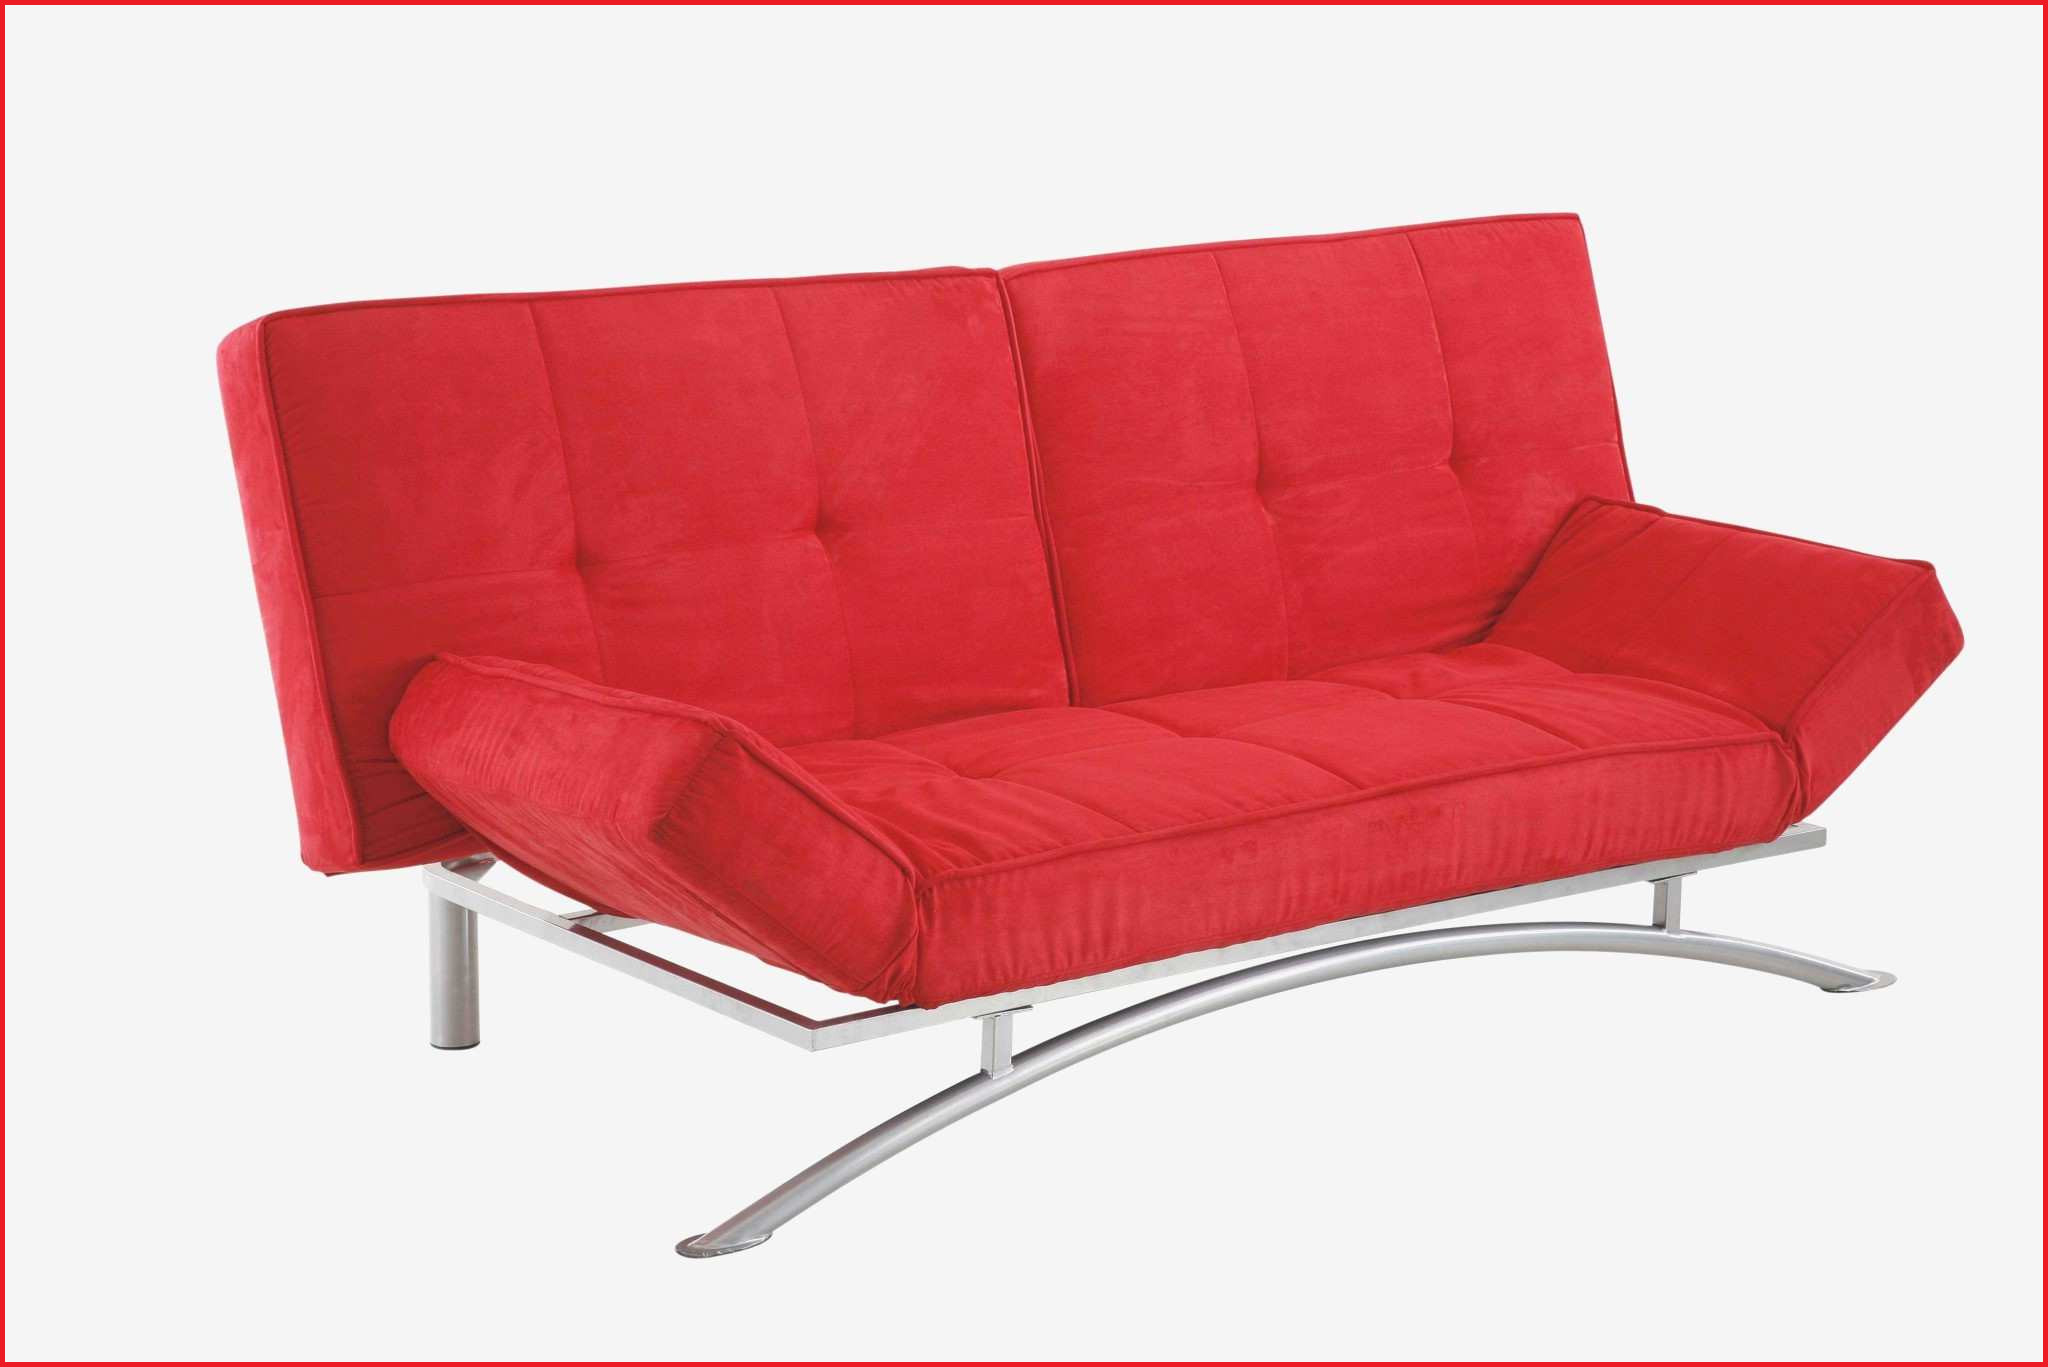 Sofa Rinconera Ikea Ipdd Sofas Modular Sectional Sofa Ikea Ektorp